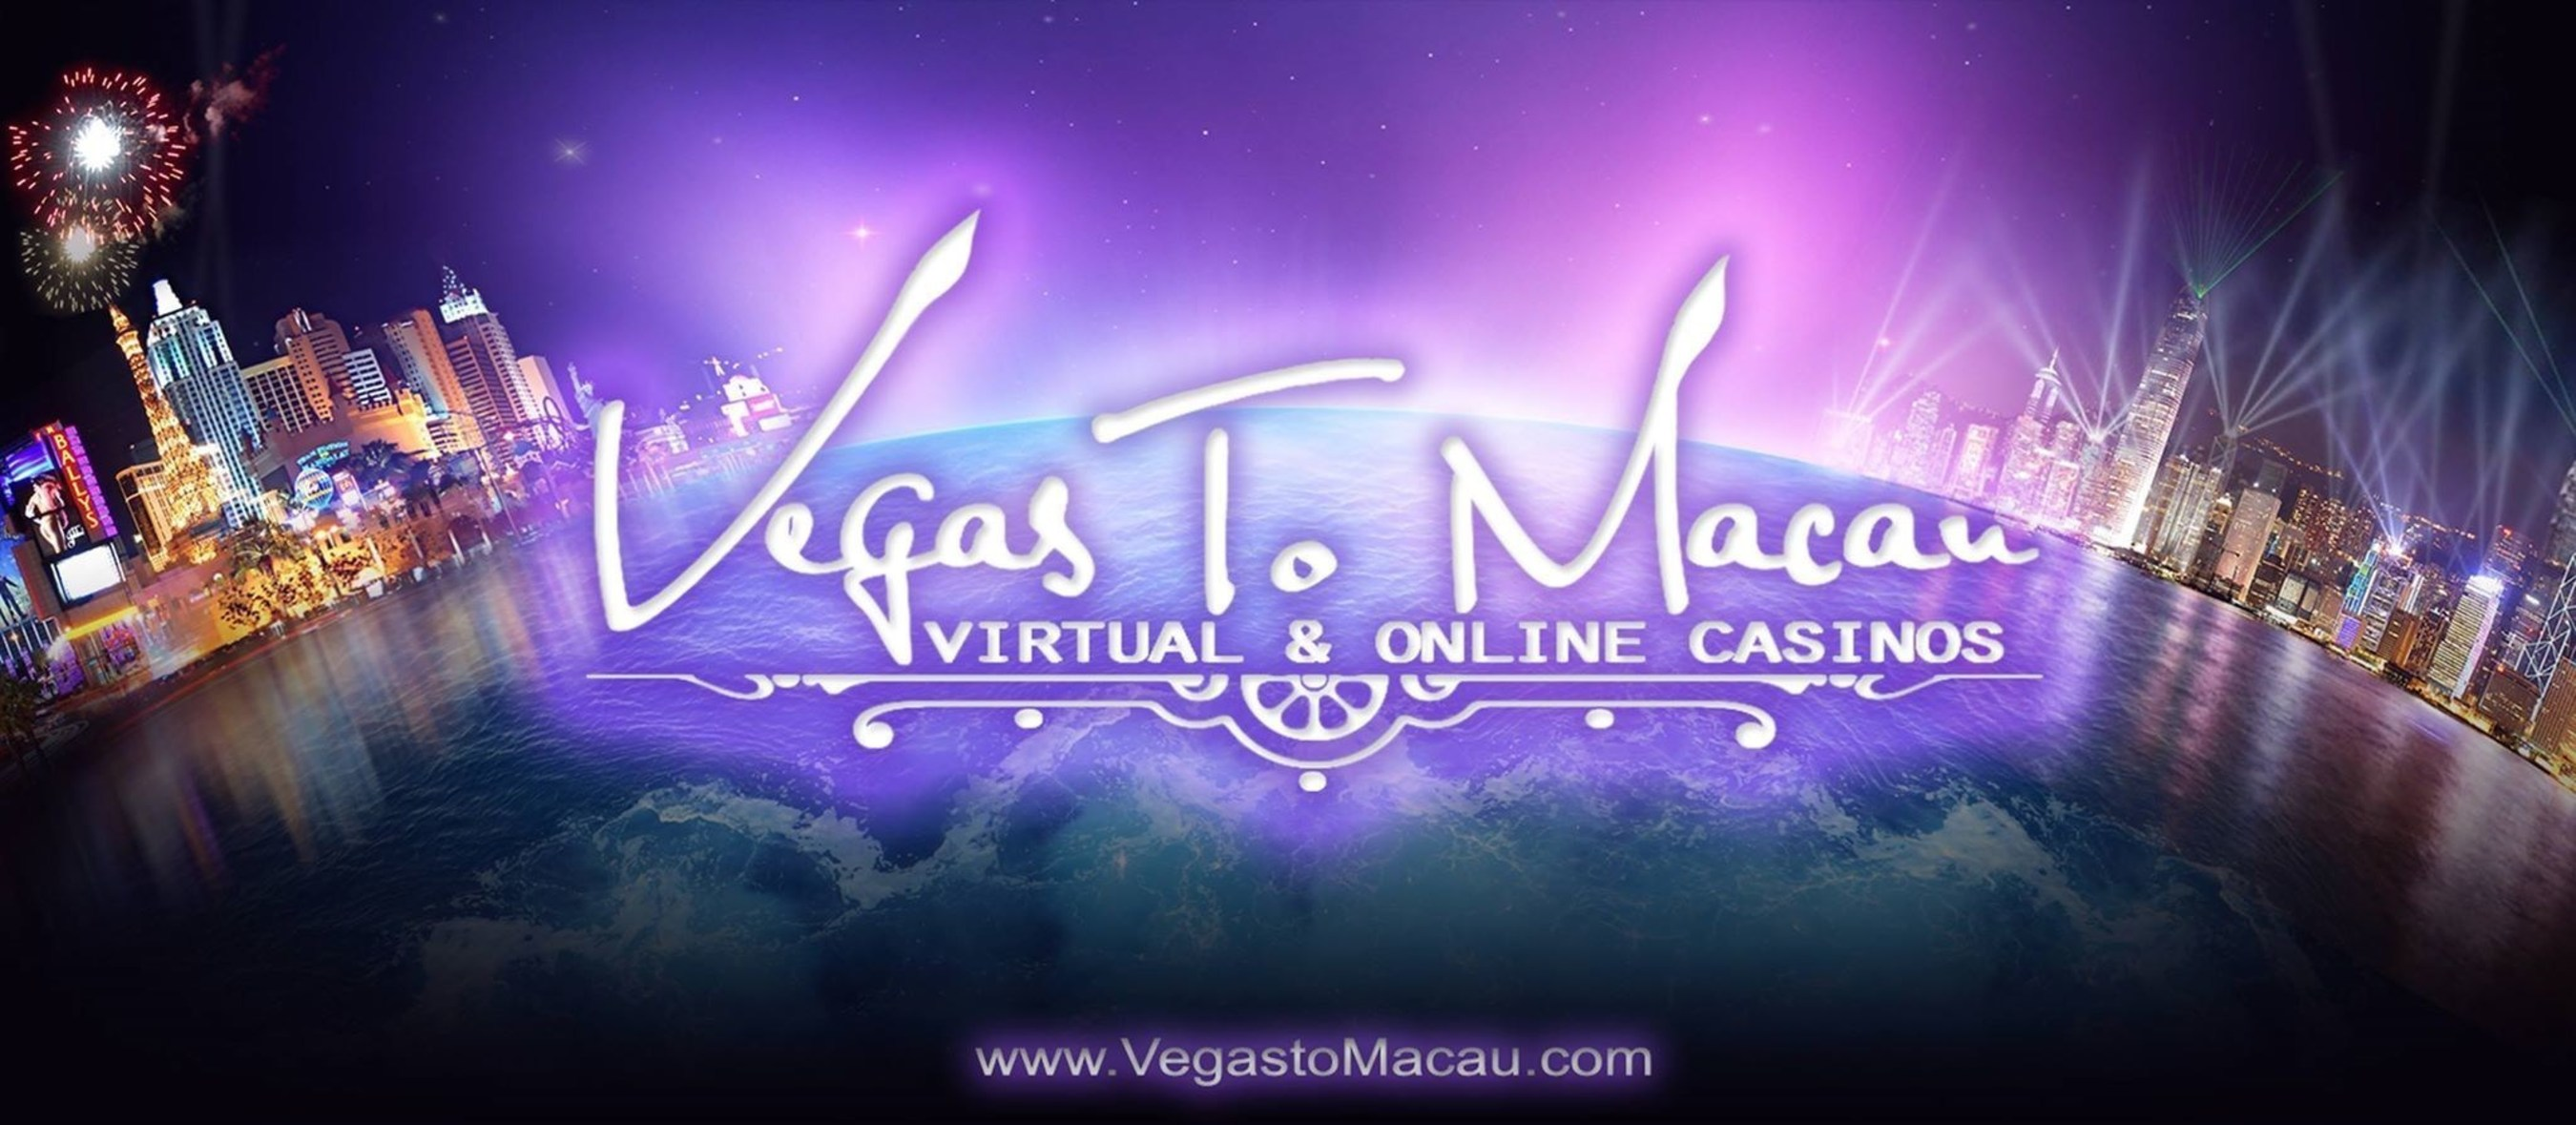 Vegas to Macau Website Launches